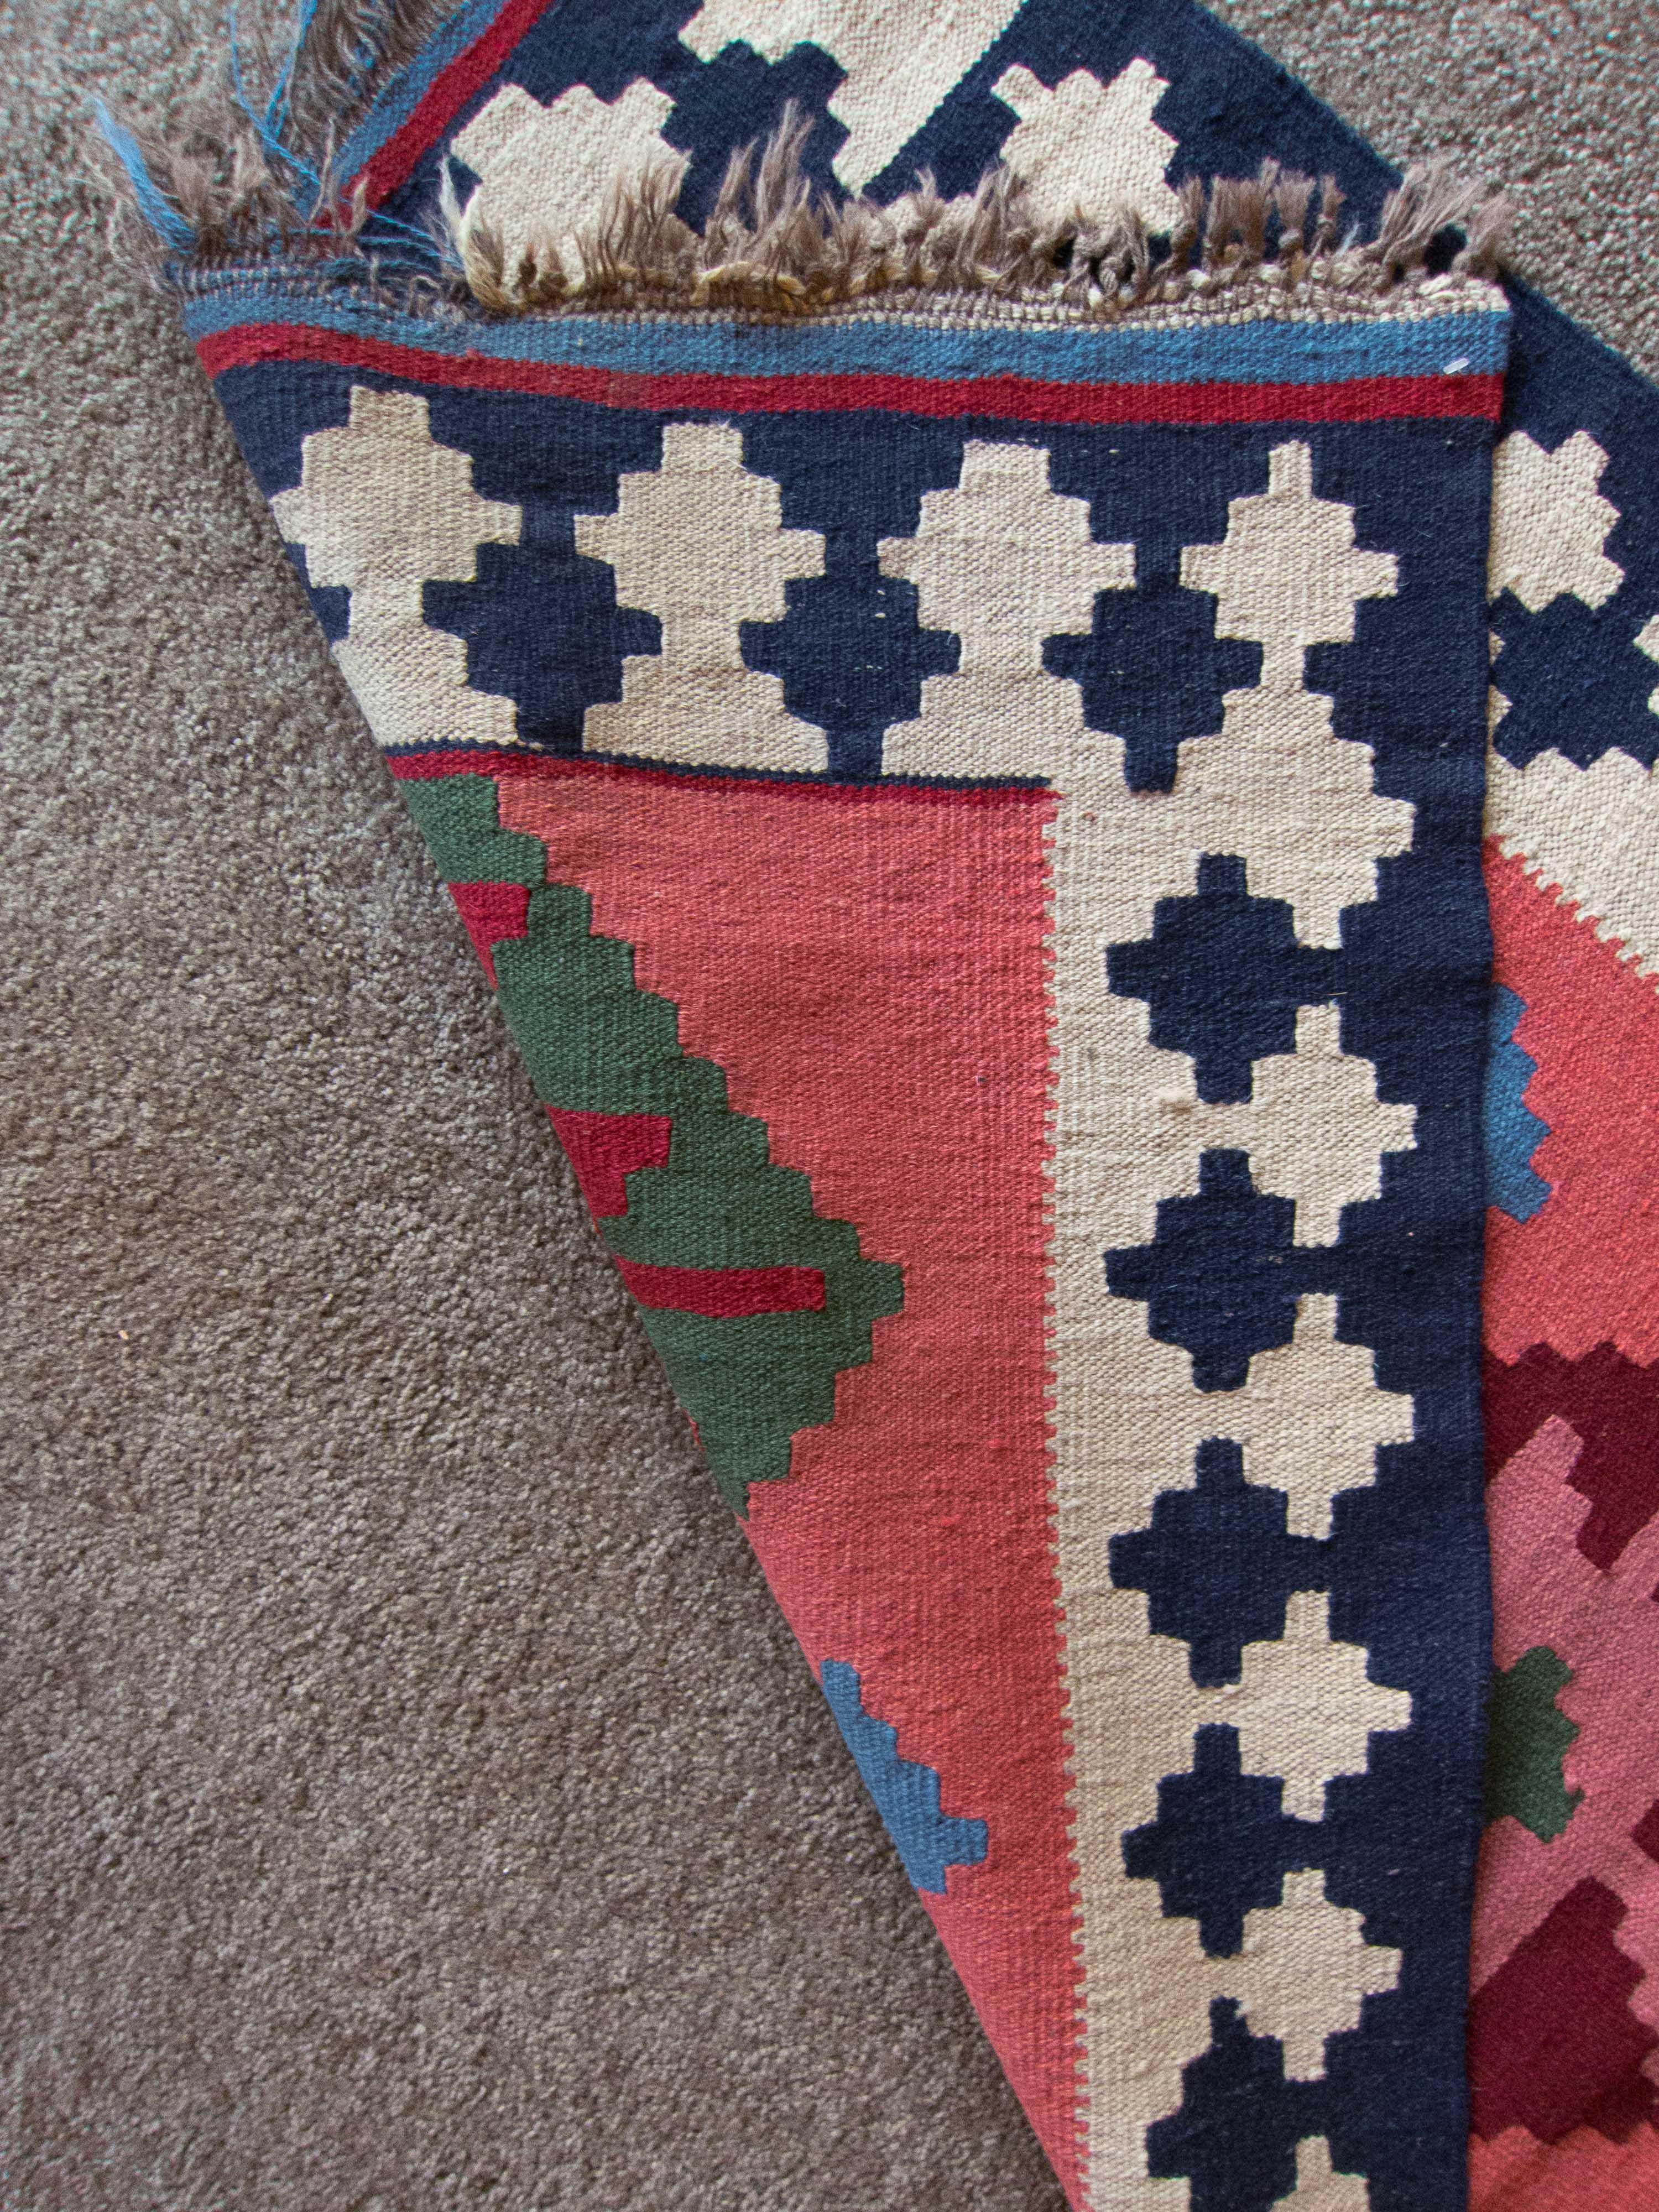 td v runner ebay antiques rugs ft navajo the p community rug archive x